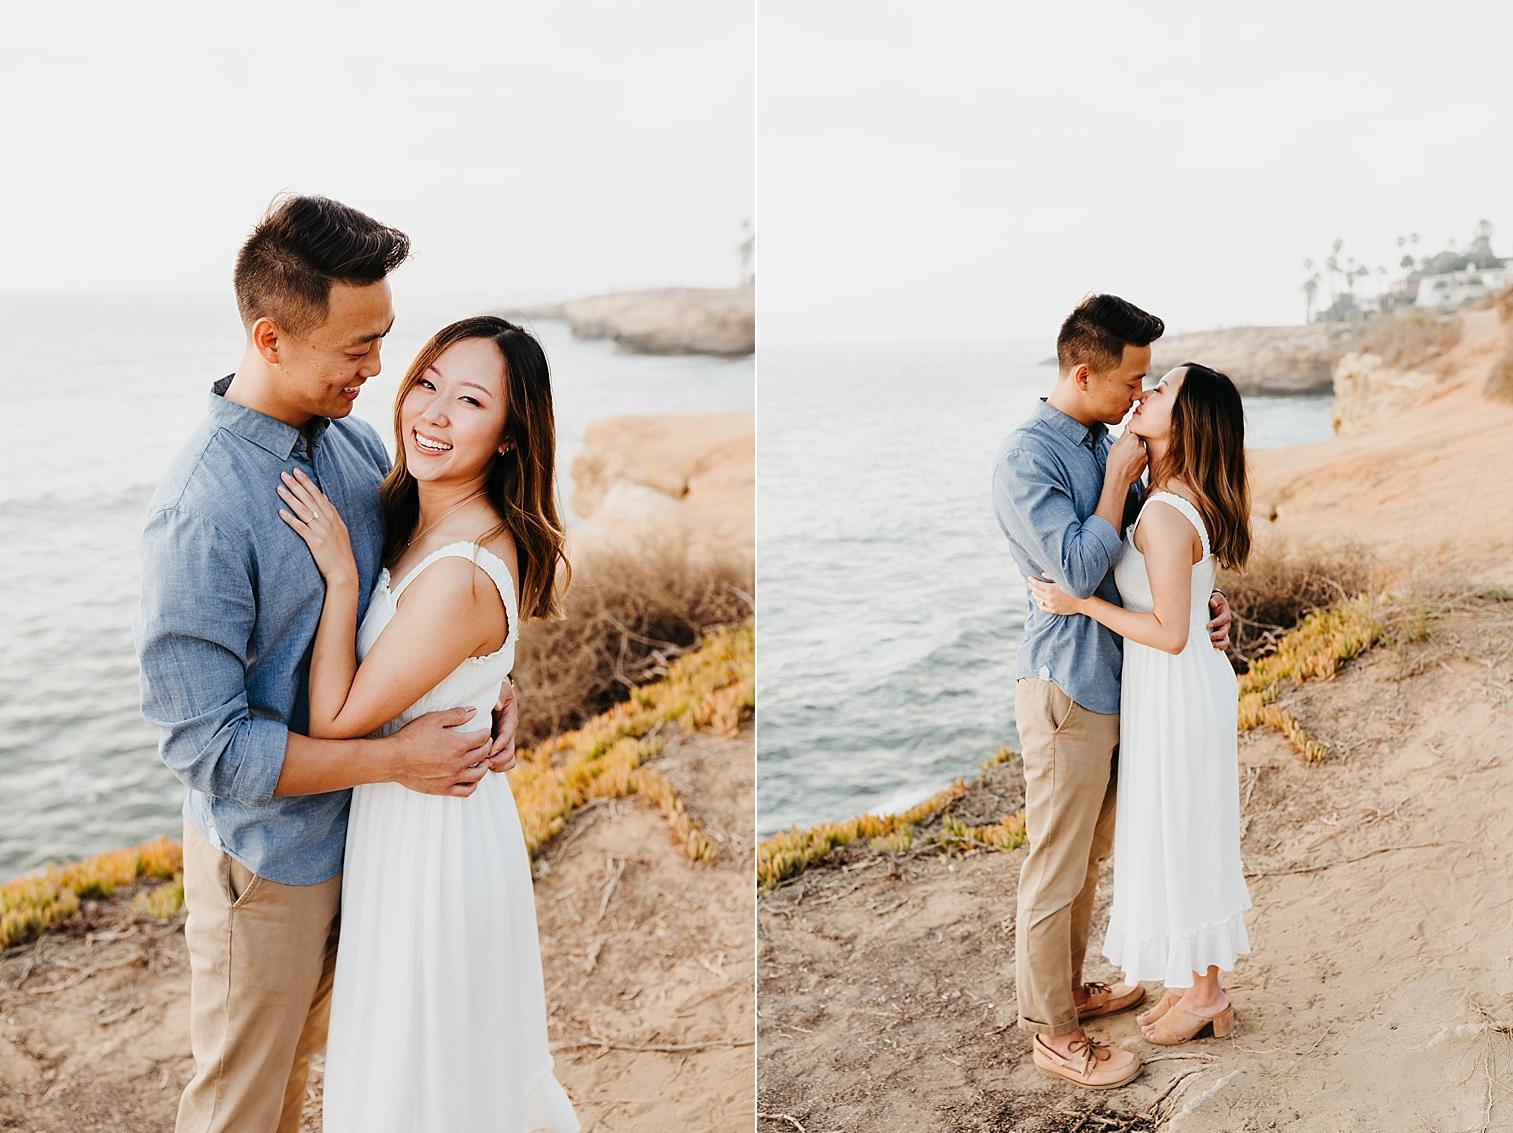 San-Diego-Ocean-Beach-Engagement-Session-26.jpg